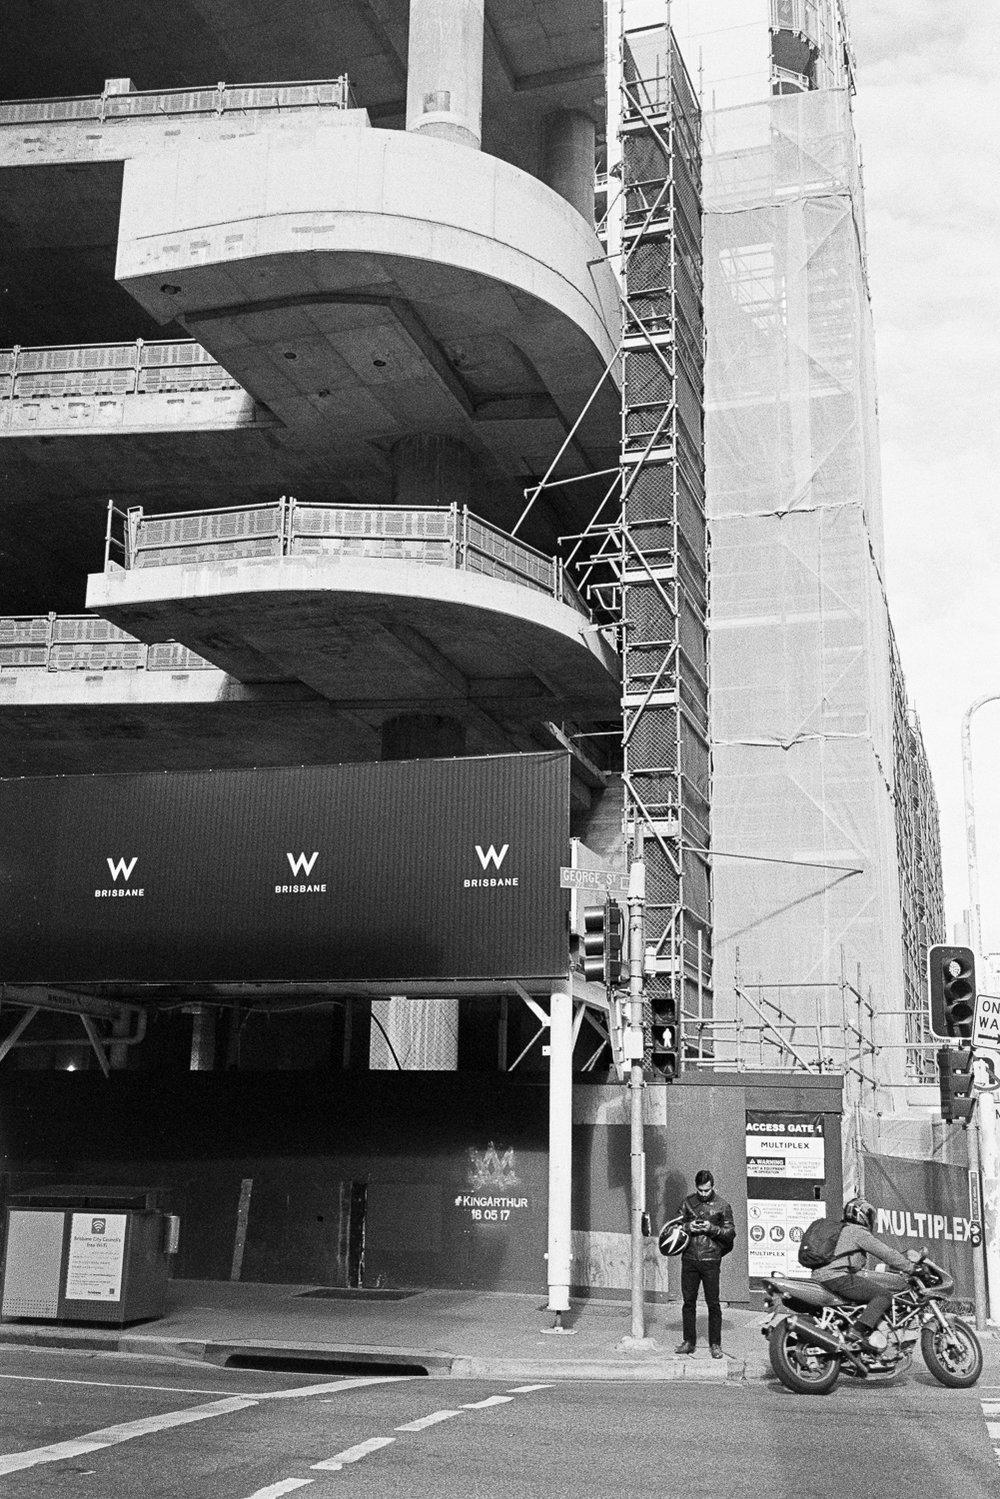 Building buildings.